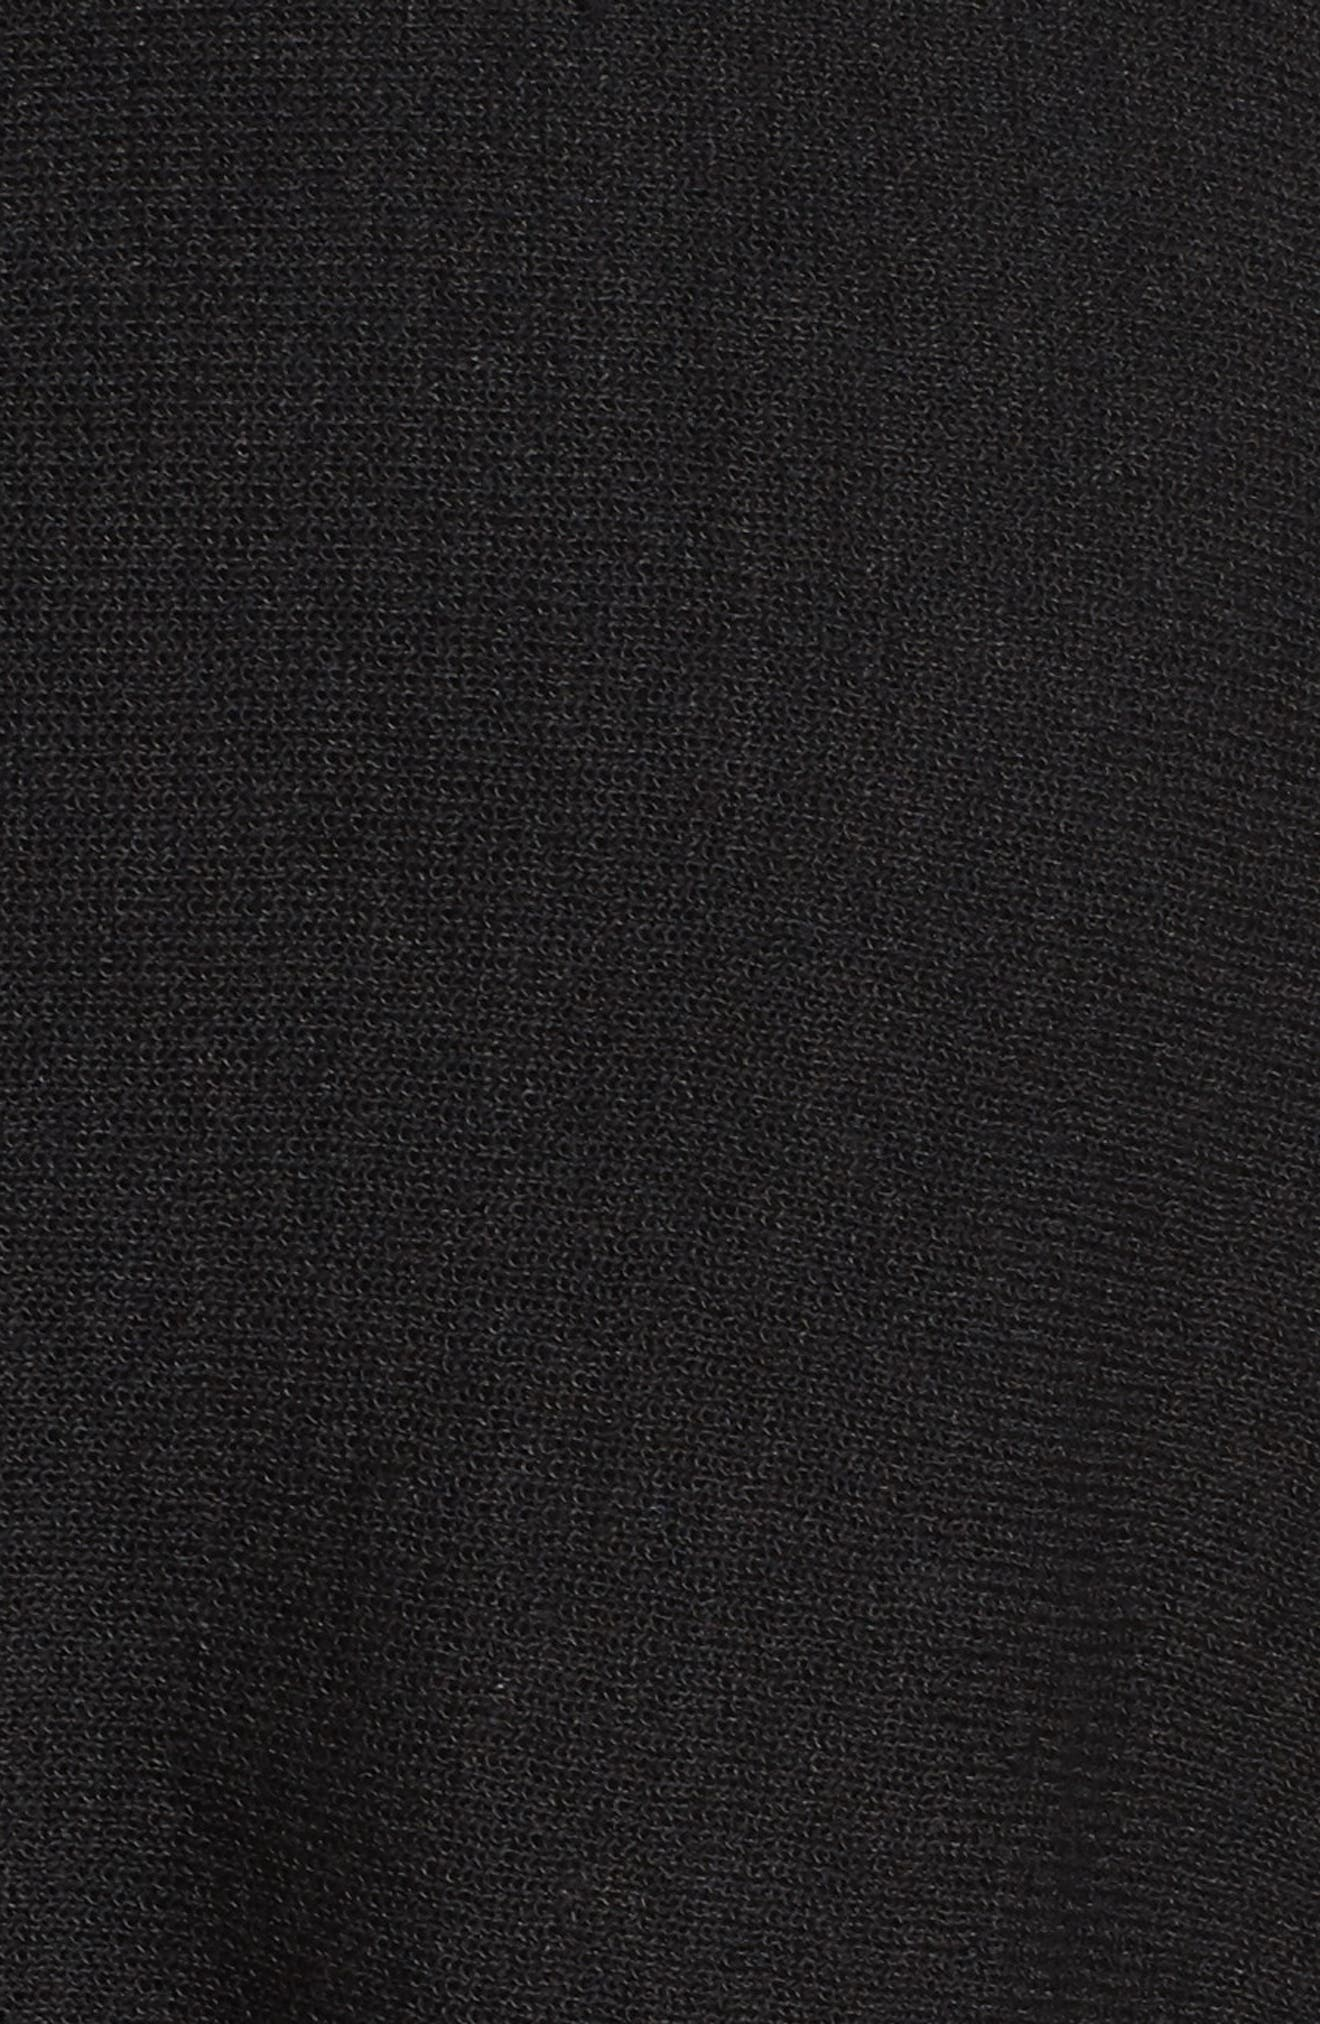 Alternate Image 5  - Sejour Sheer Inset Linen Blend Tunic Top (Plus Size)